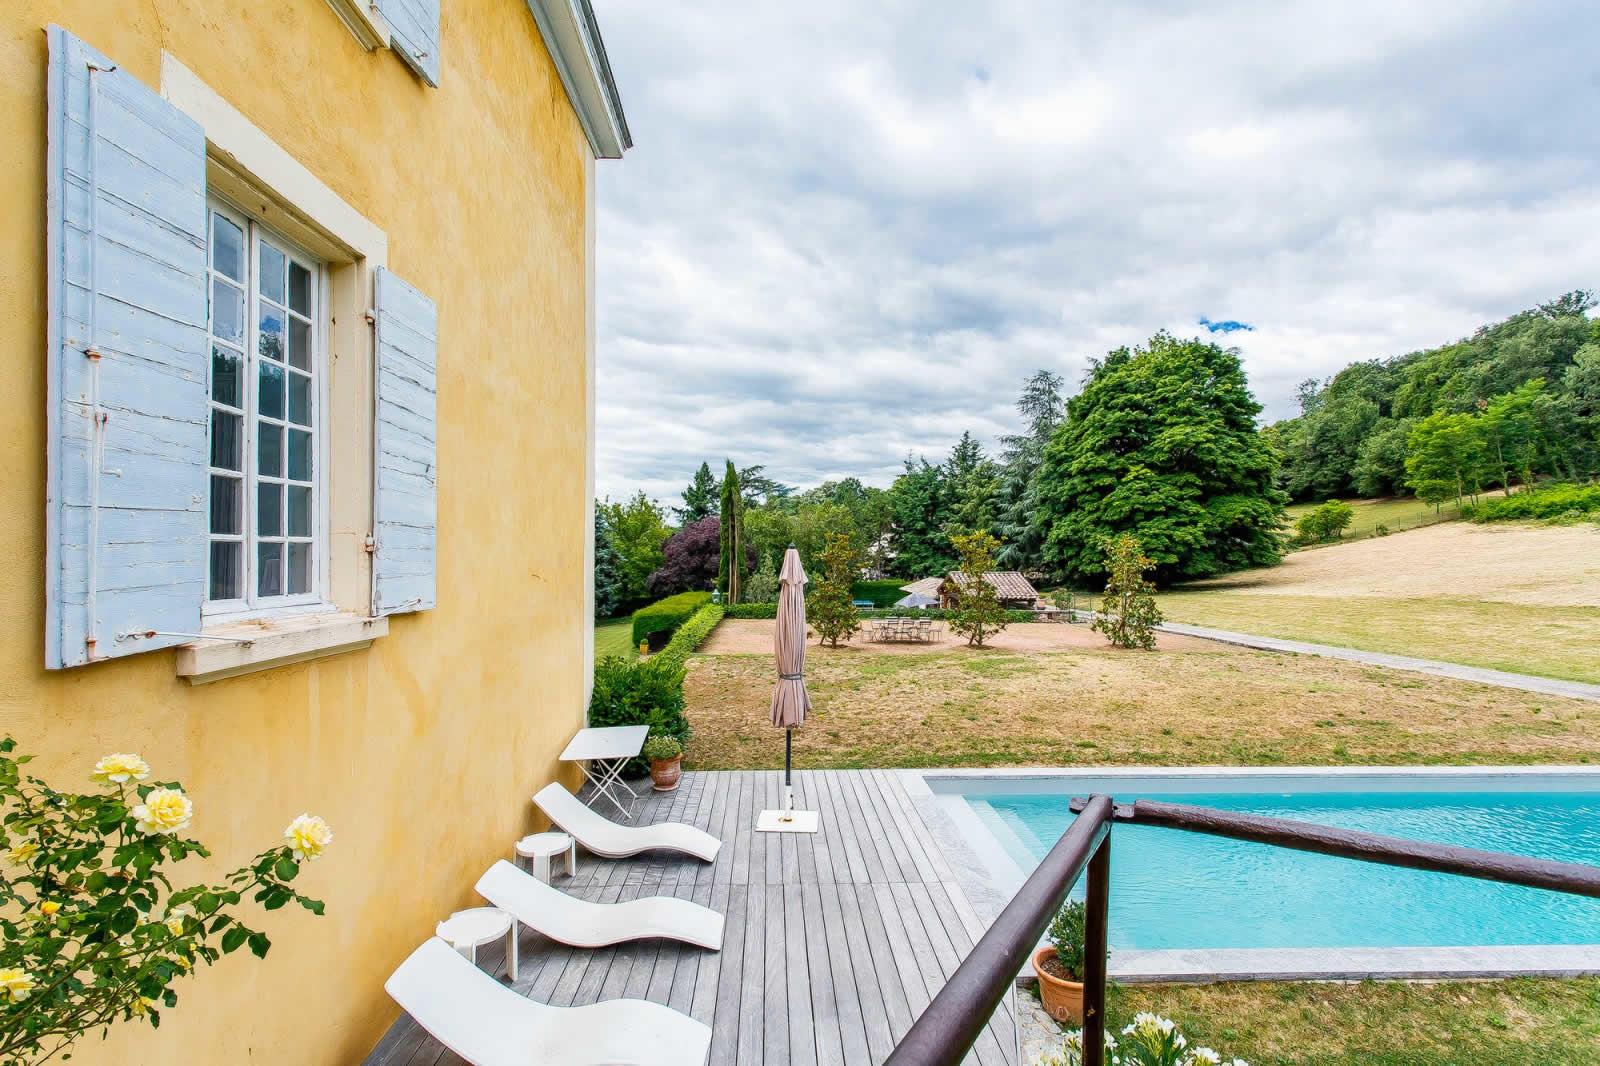 tres-belle-propriete-a-vendre-saint-genis-laval-veranda-jardin-piscine